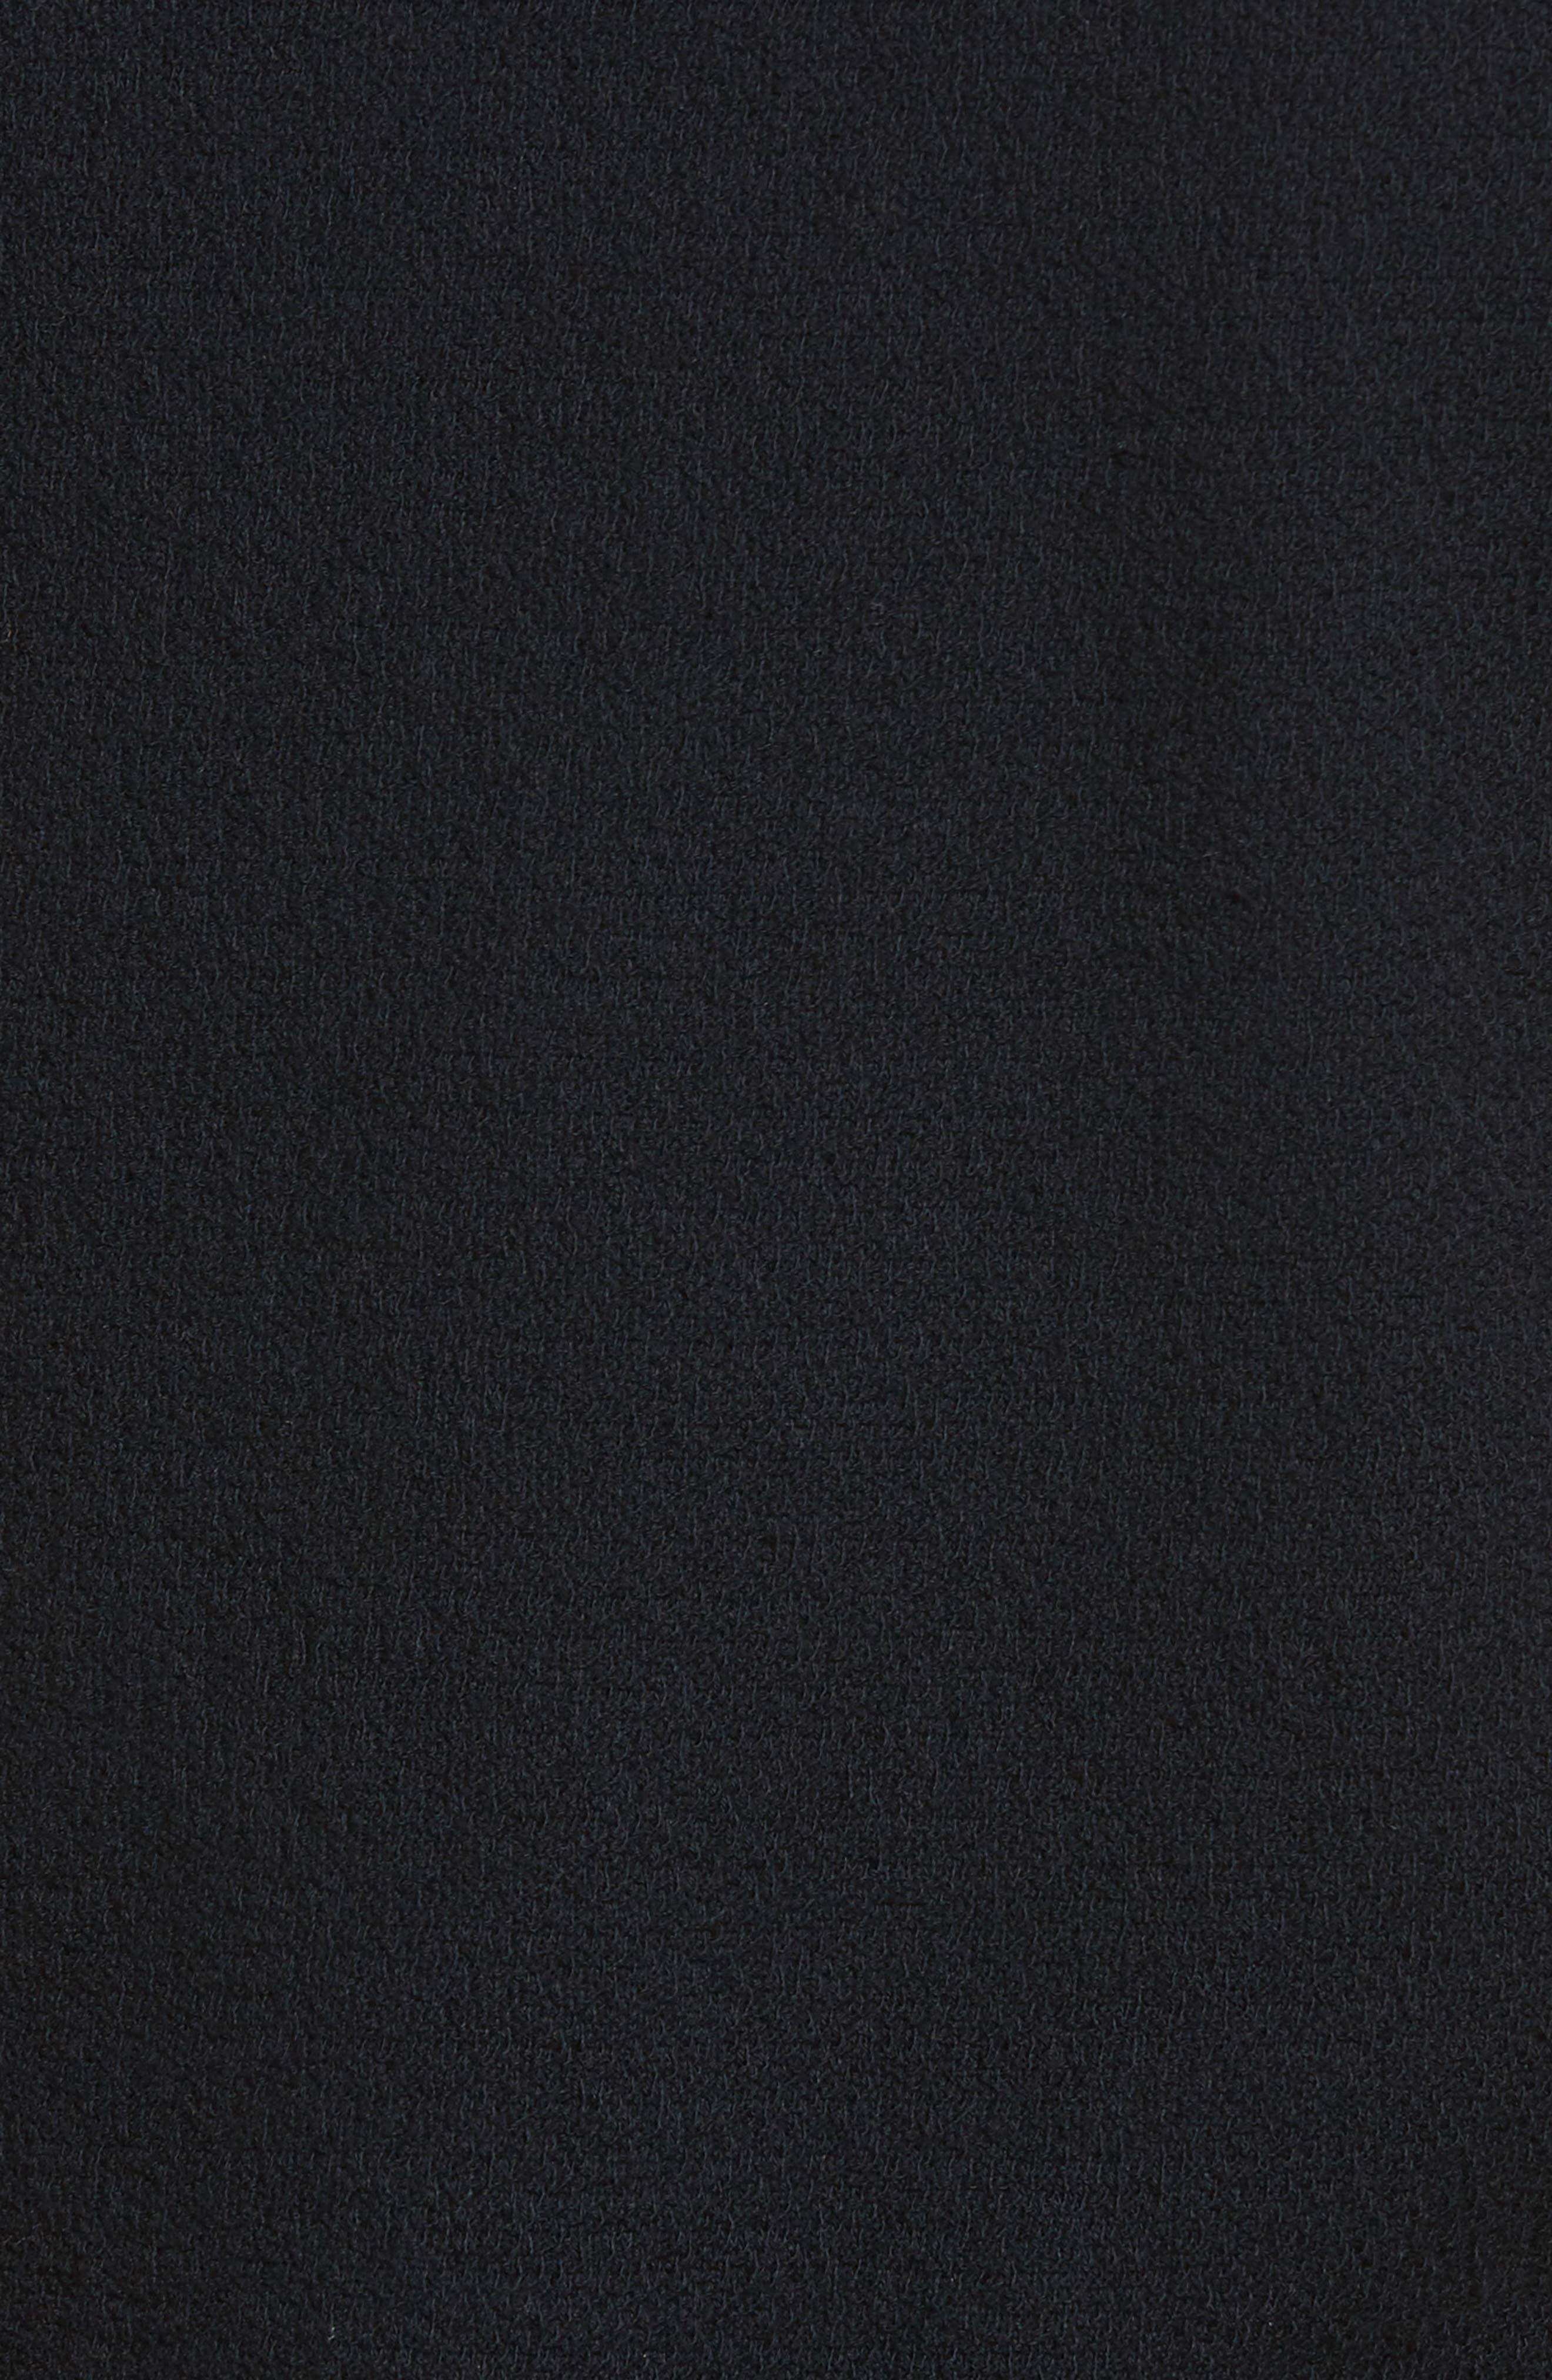 MADEWELL, Modern Tie Front Tee, Alternate thumbnail 6, color, TRUE BLACK